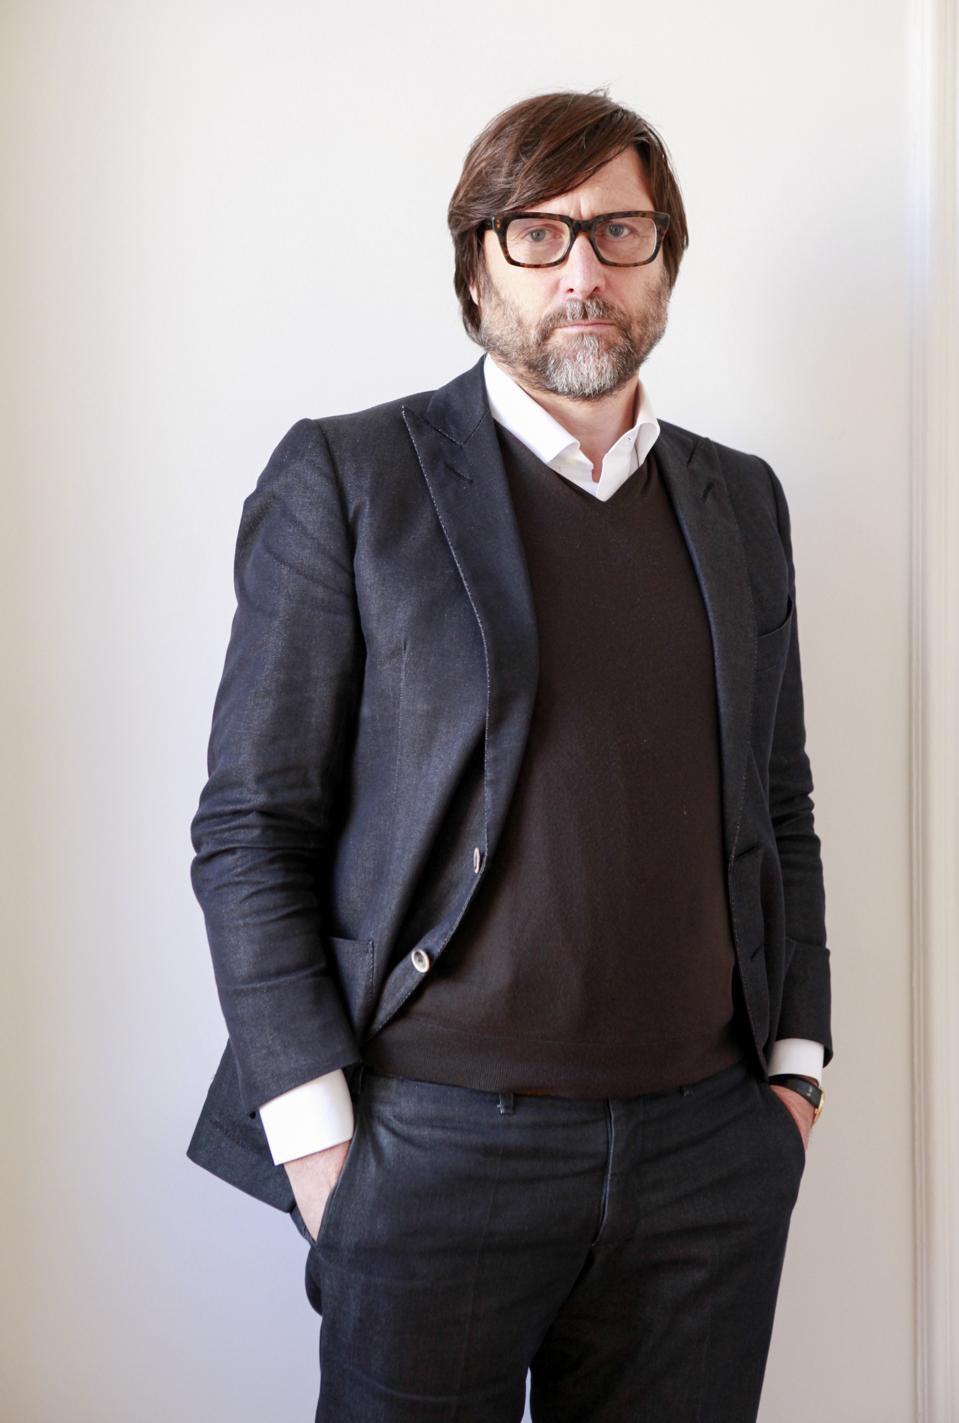 Claudio Marenzi President and CEO of Herno